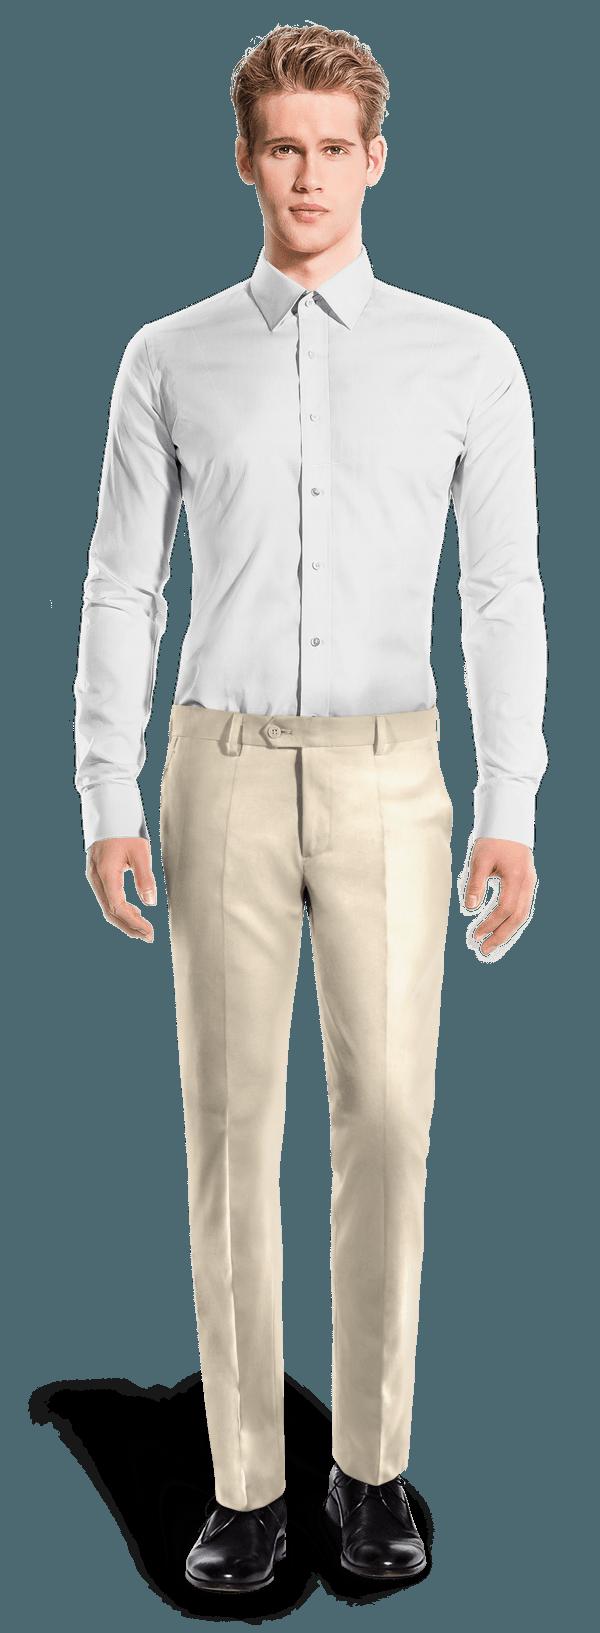 Pantaloni slim fit chiaro di Poliestere